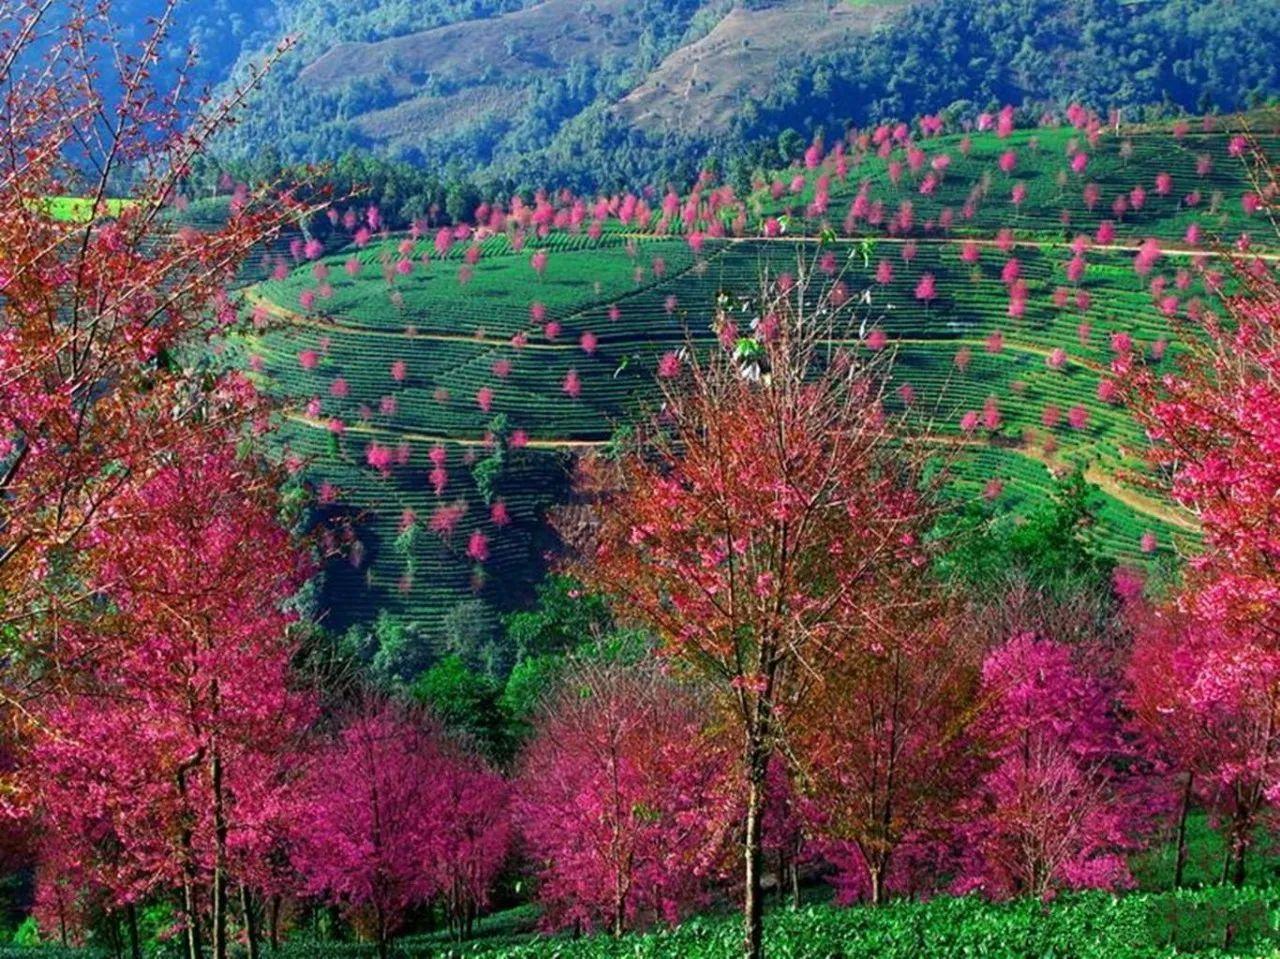 www.bmw999.com:冬日无量山 赏茶园中的樱花林